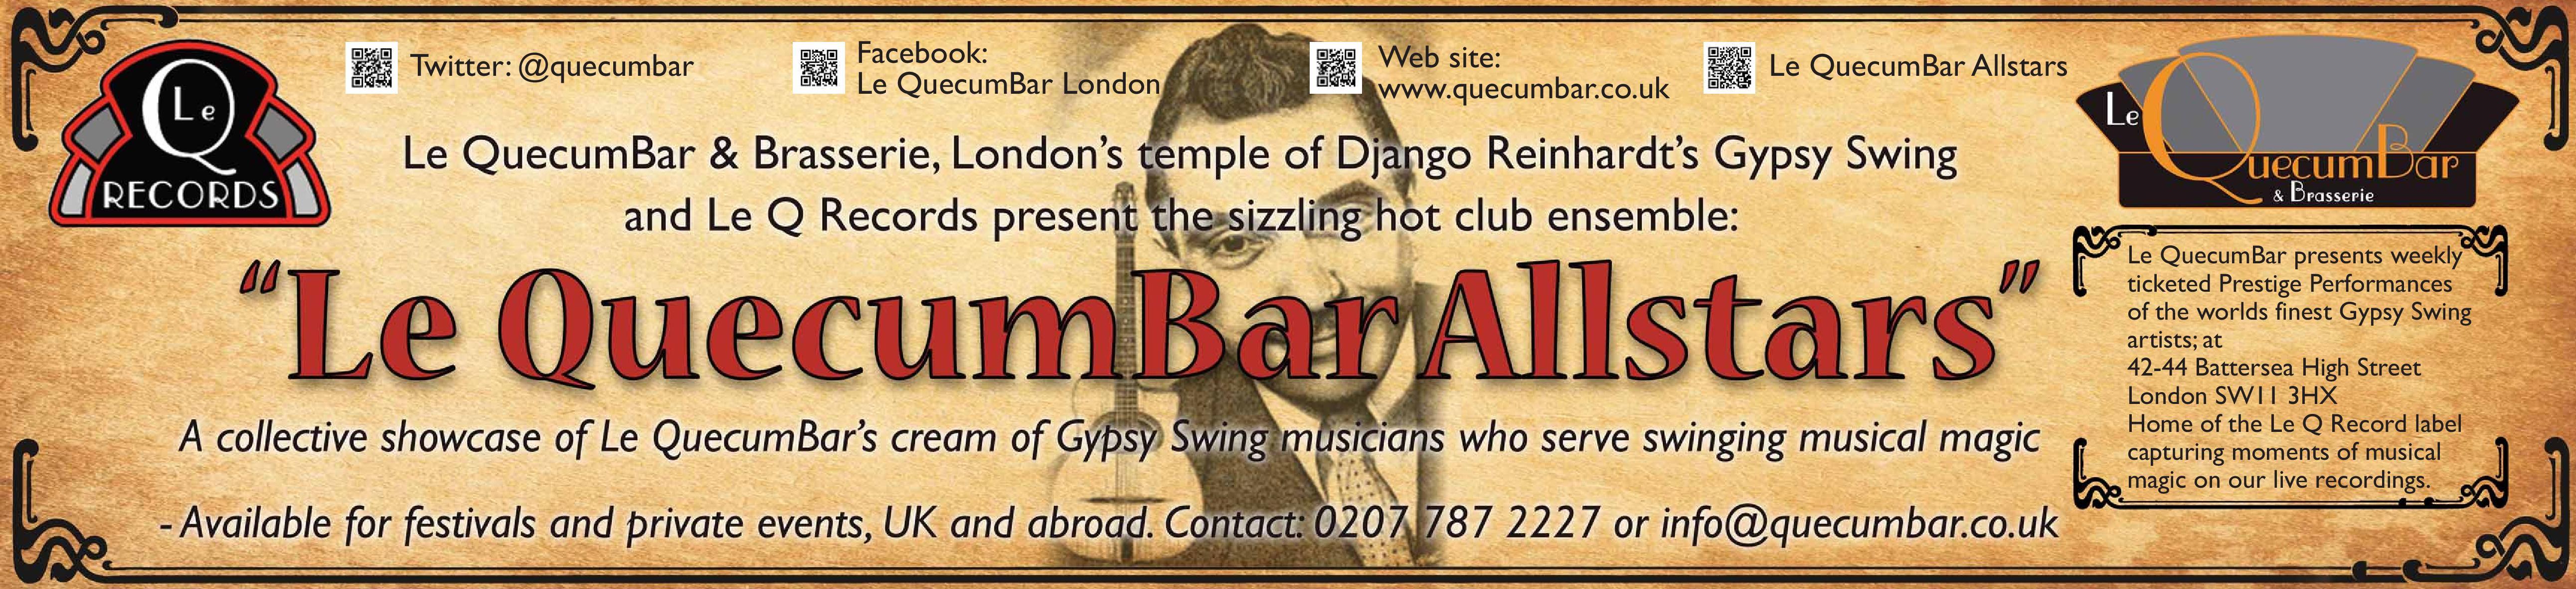 banner allstars-page-001